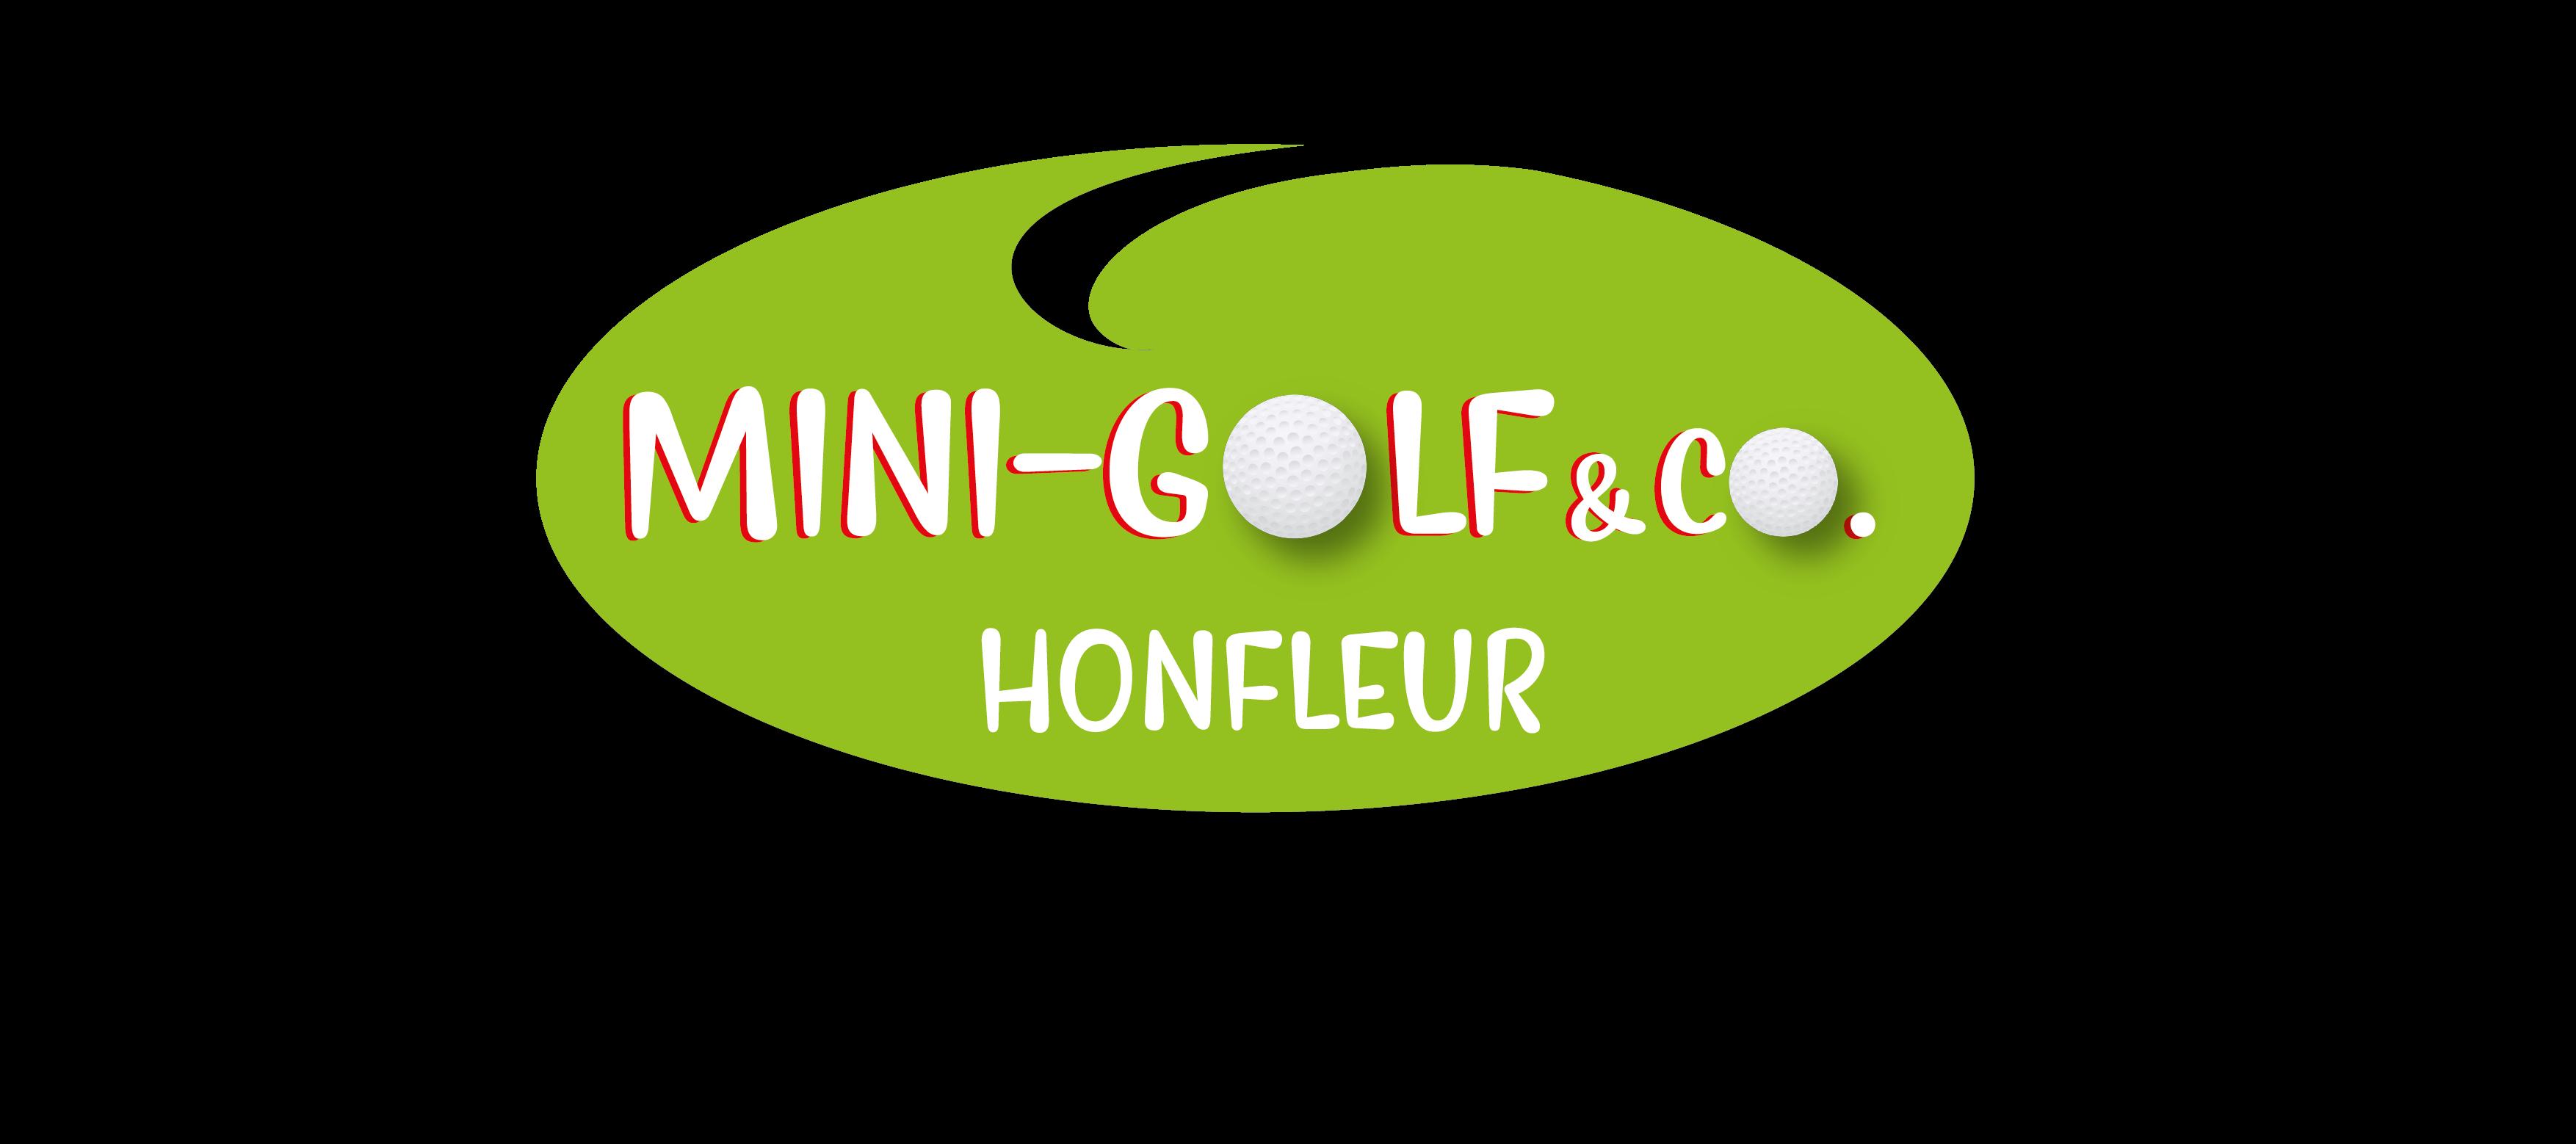 Mini-Golf and co.